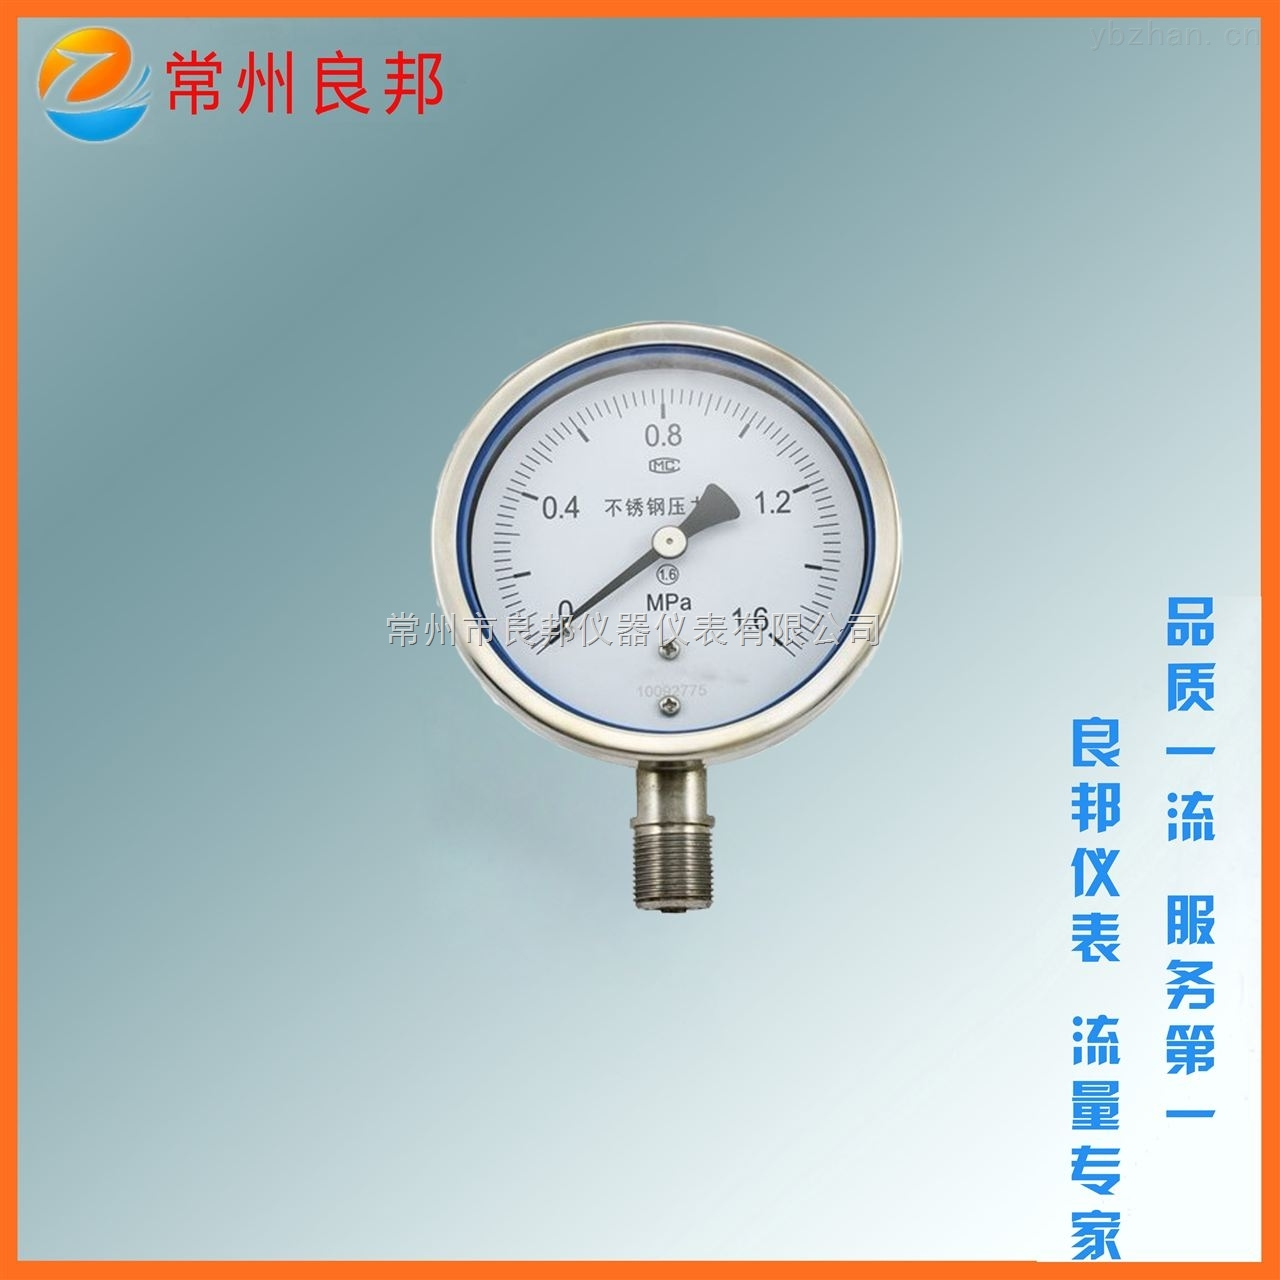 YT-差動遠傳壓力表應用